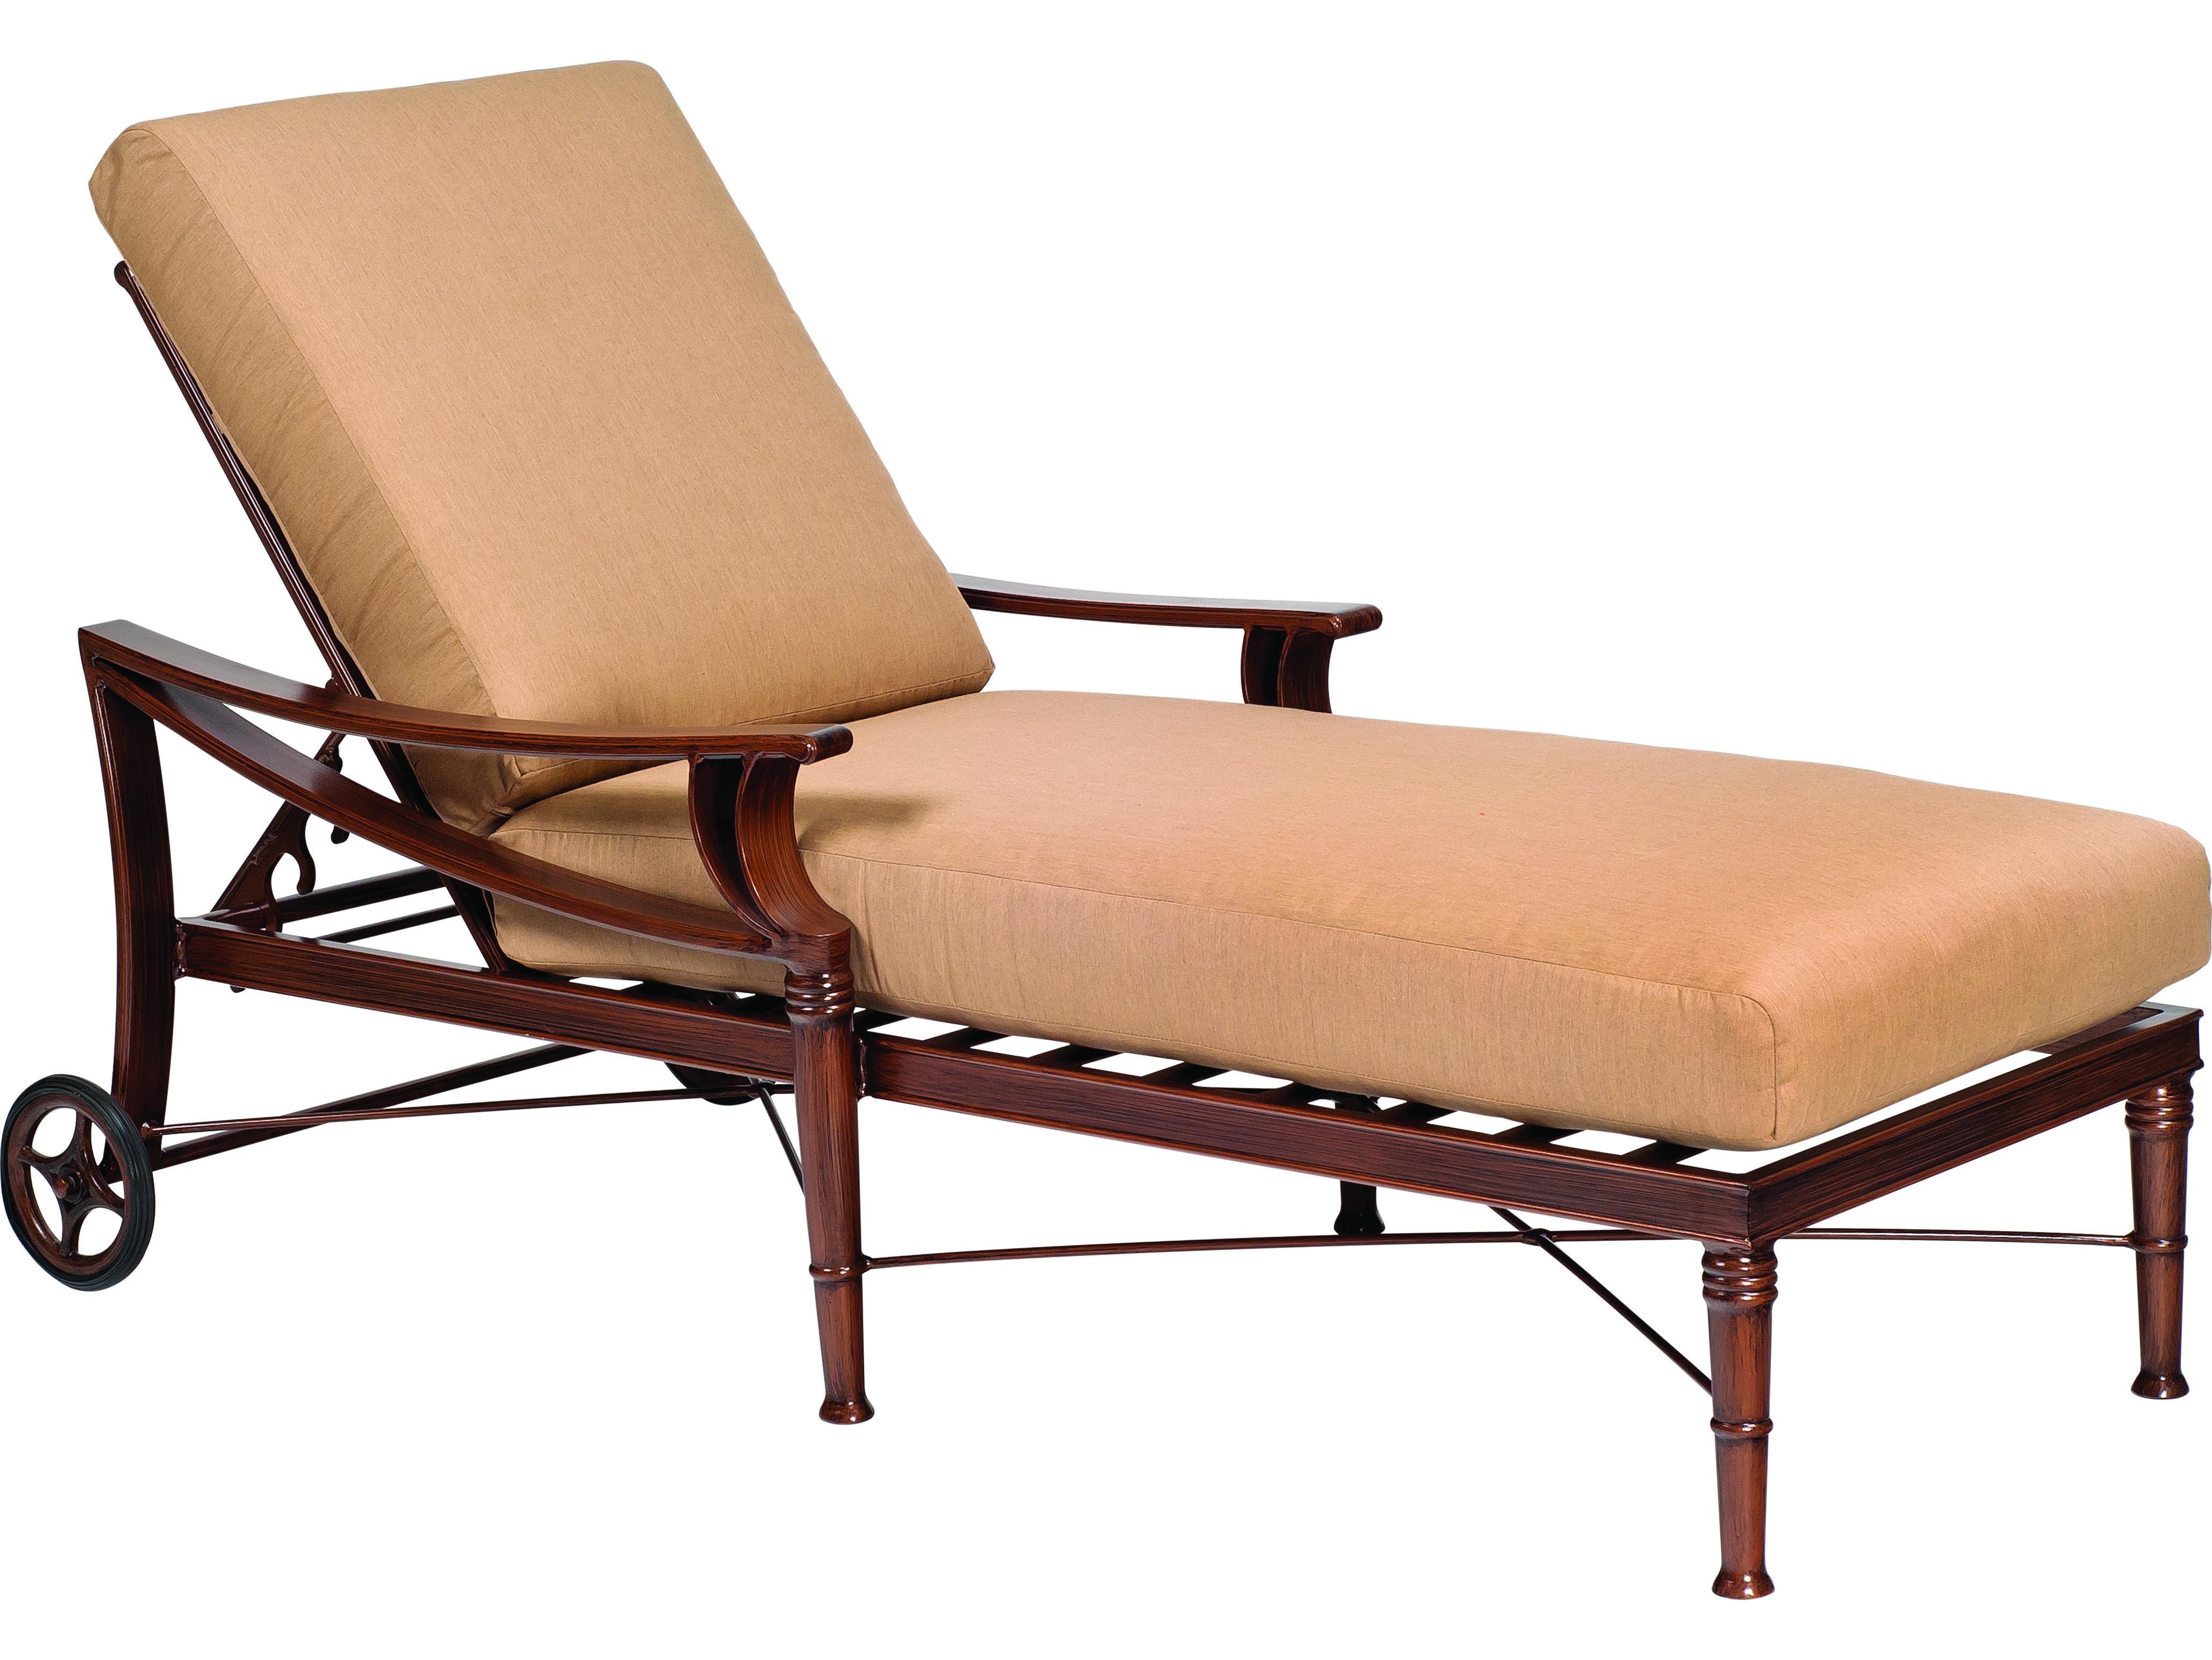 spotlight outdoor chair covers lounge woodard arkadia cushion aluminum adjustable chaise 590470